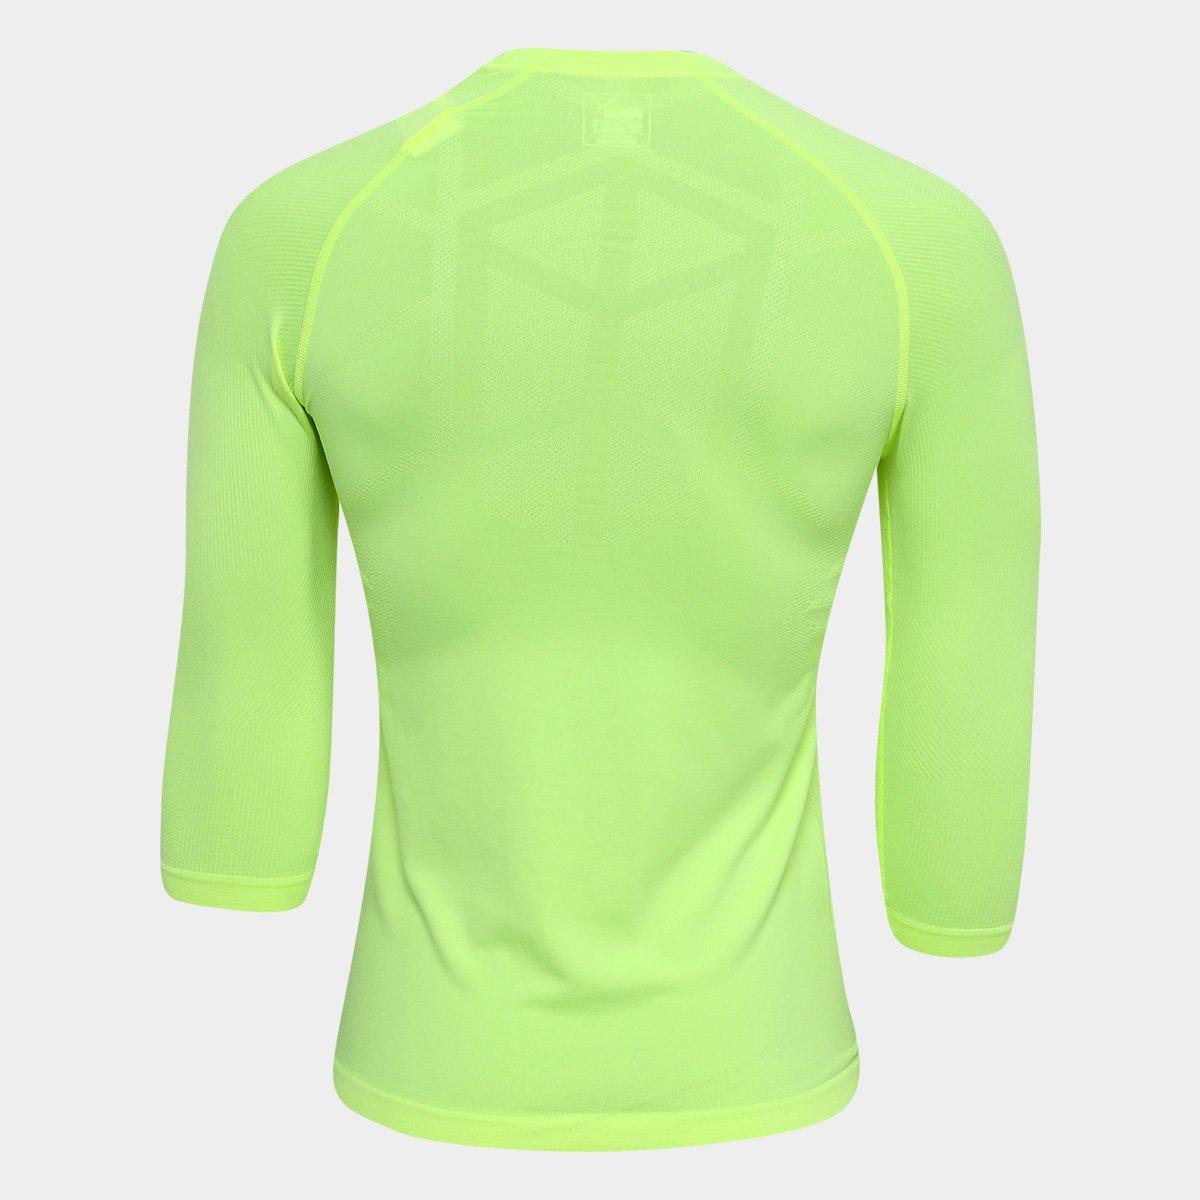 ... Camiseta Compressão Puma Manga Longa Futebol Next Masculina ... aa6fcca9f61e8